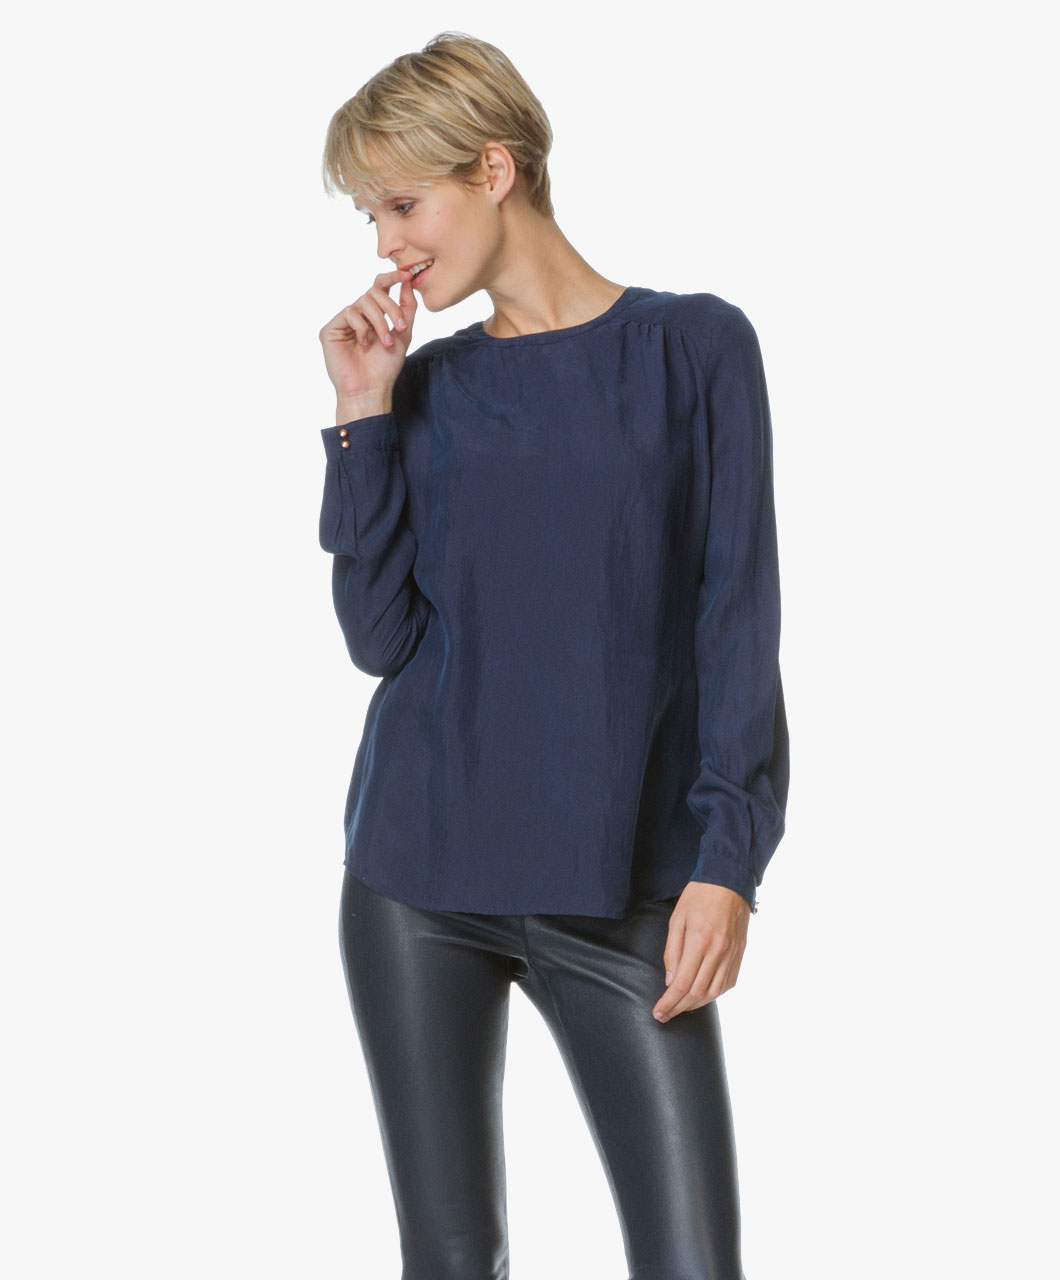 boss orange edic silk blouse dark blue edic 50327951 405 dark. Black Bedroom Furniture Sets. Home Design Ideas